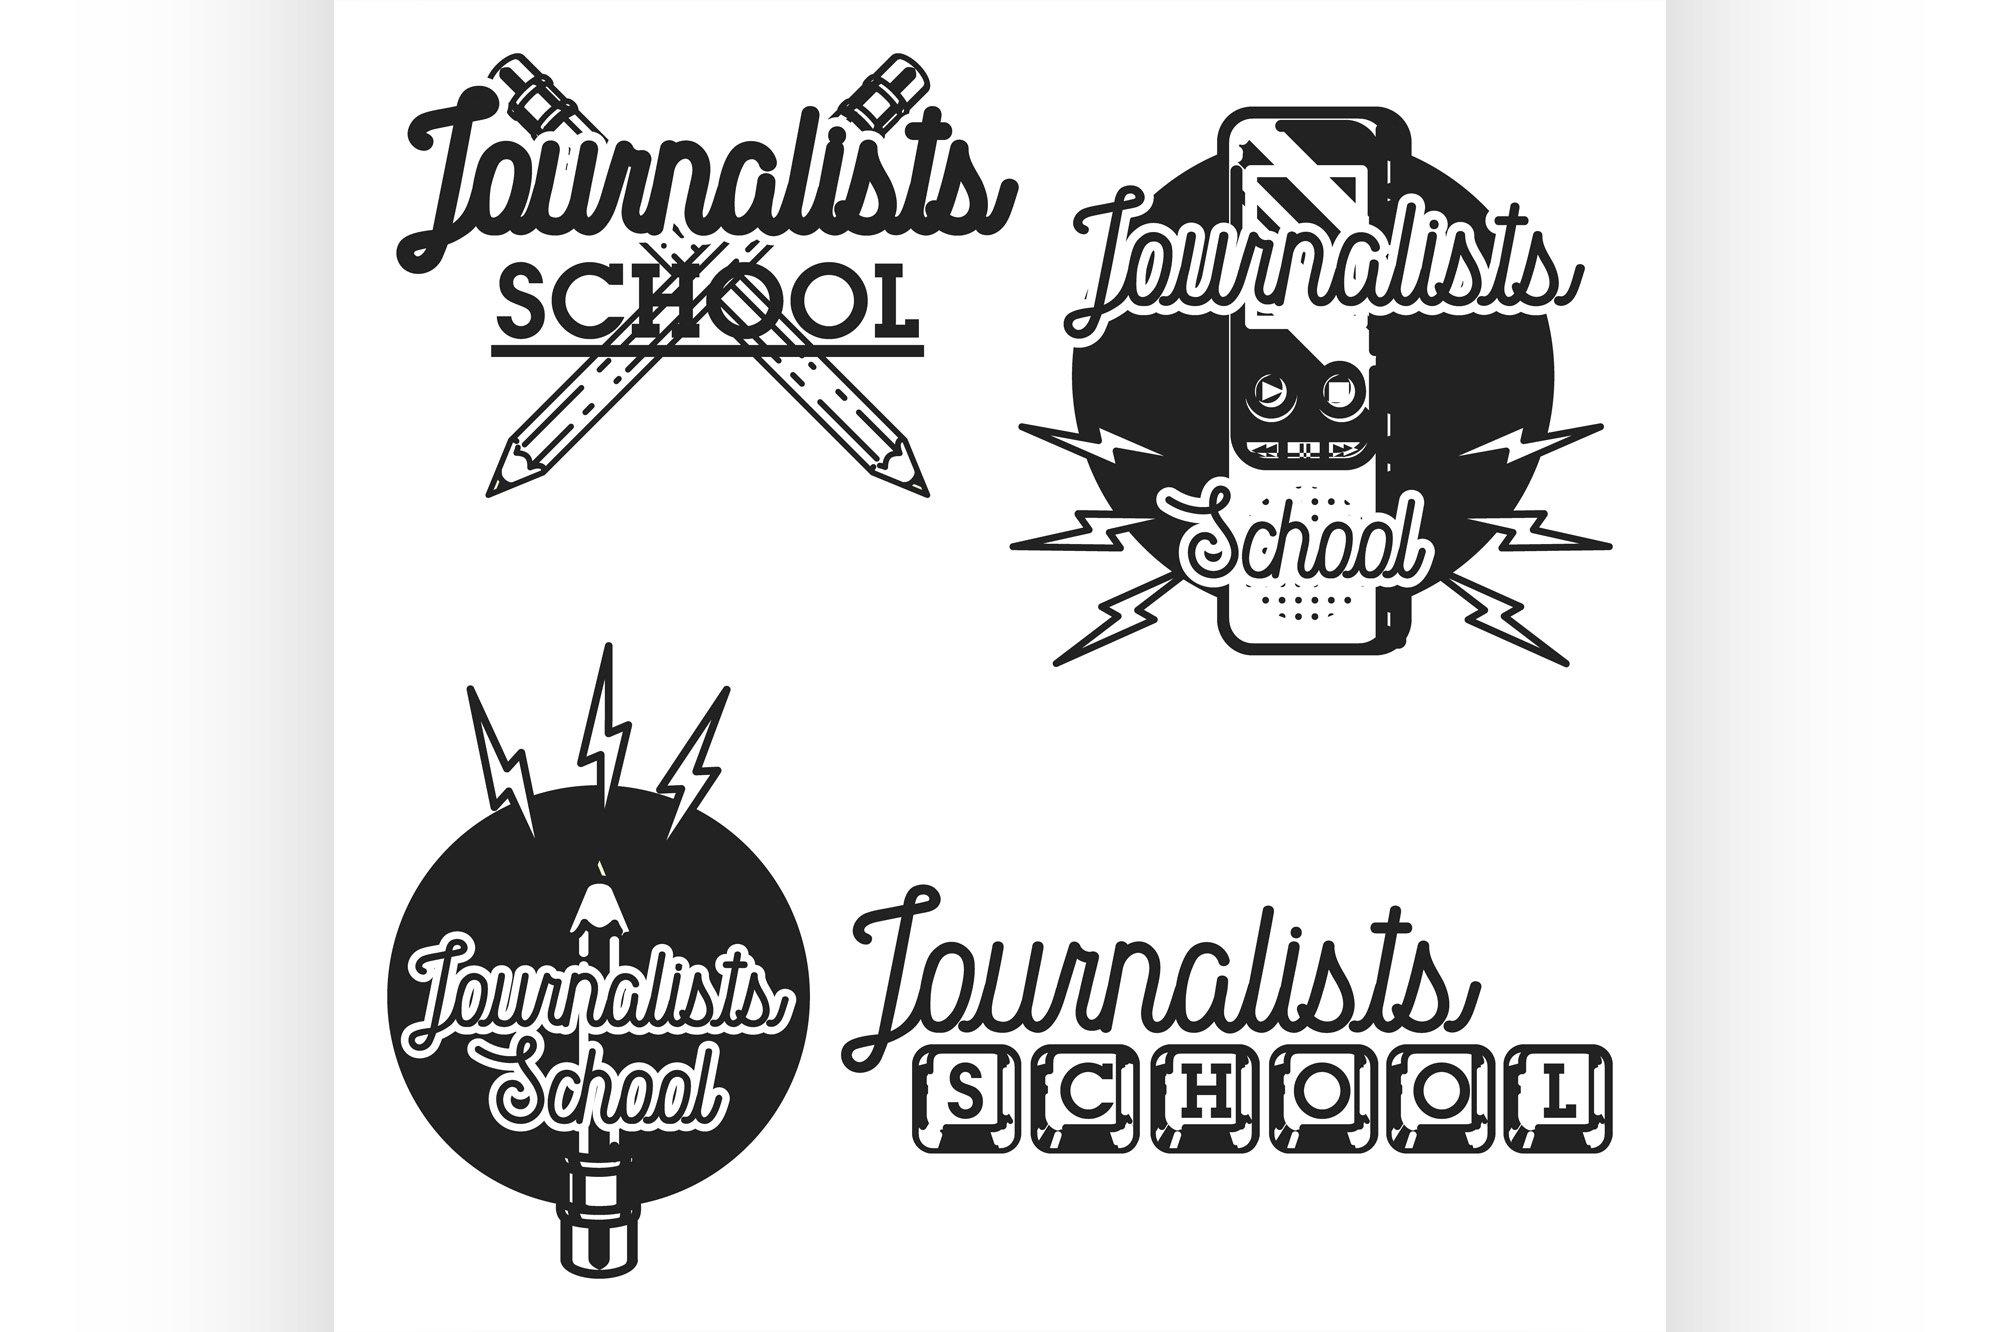 Color vintage journalists school emblems example image 1